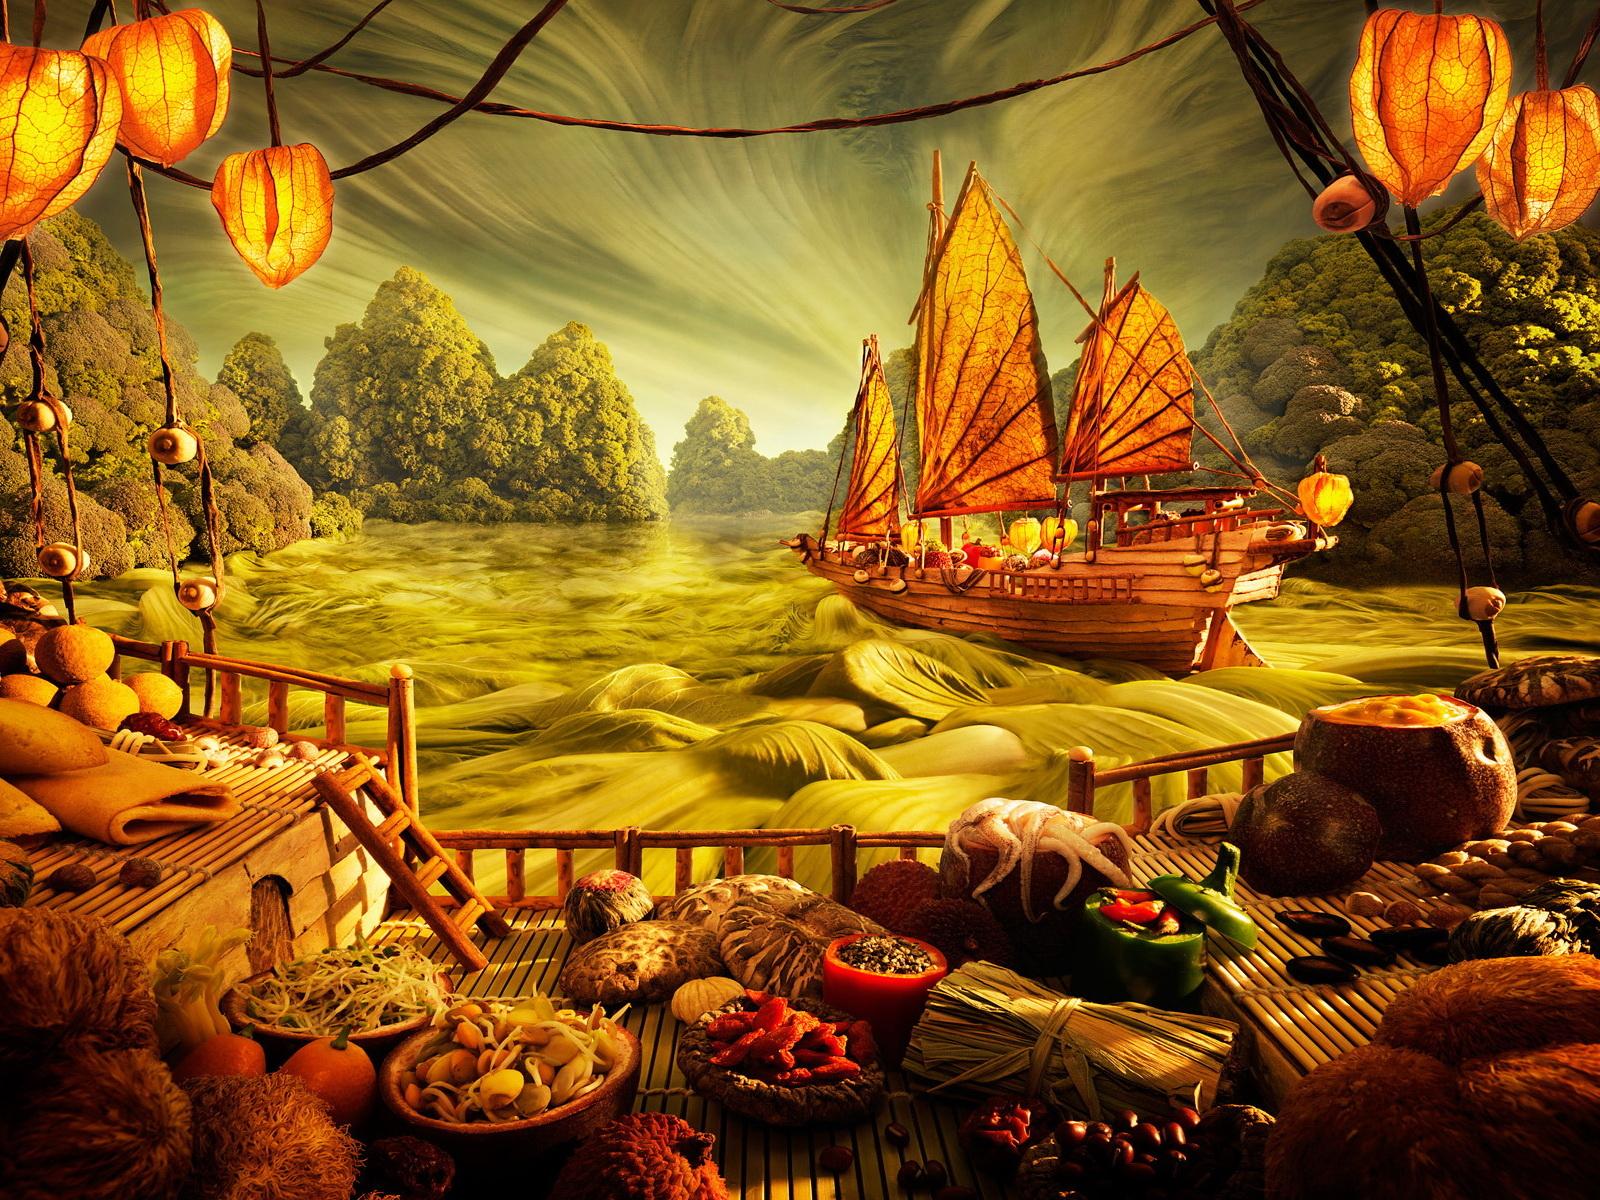 http://2.bp.blogspot.com/-D5MsYeAEyXU/TuknVSrjsSI/AAAAAAAABEg/Ii3leR-sgNY/s1600/Food_Seafood_Eastern_Cuisine_030893_.jpg